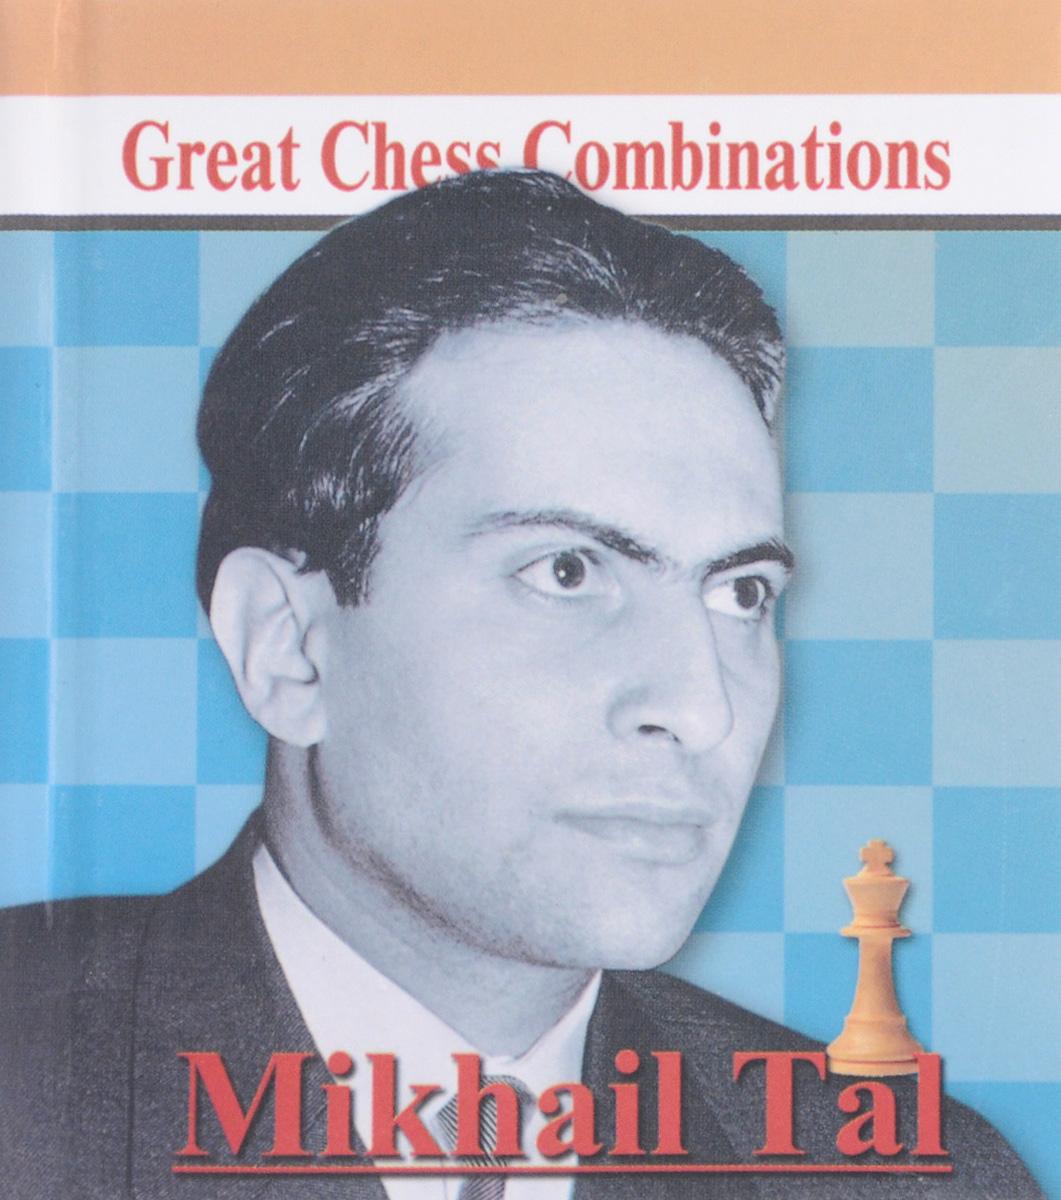 Фото - Александр Калинин Mikhail Tal: Great Chess Combinations / Михаил Таль. Лучшие шахматные комбинации (миниатюрное издание) калинин а михаил таль лучшие шахматные комбинации